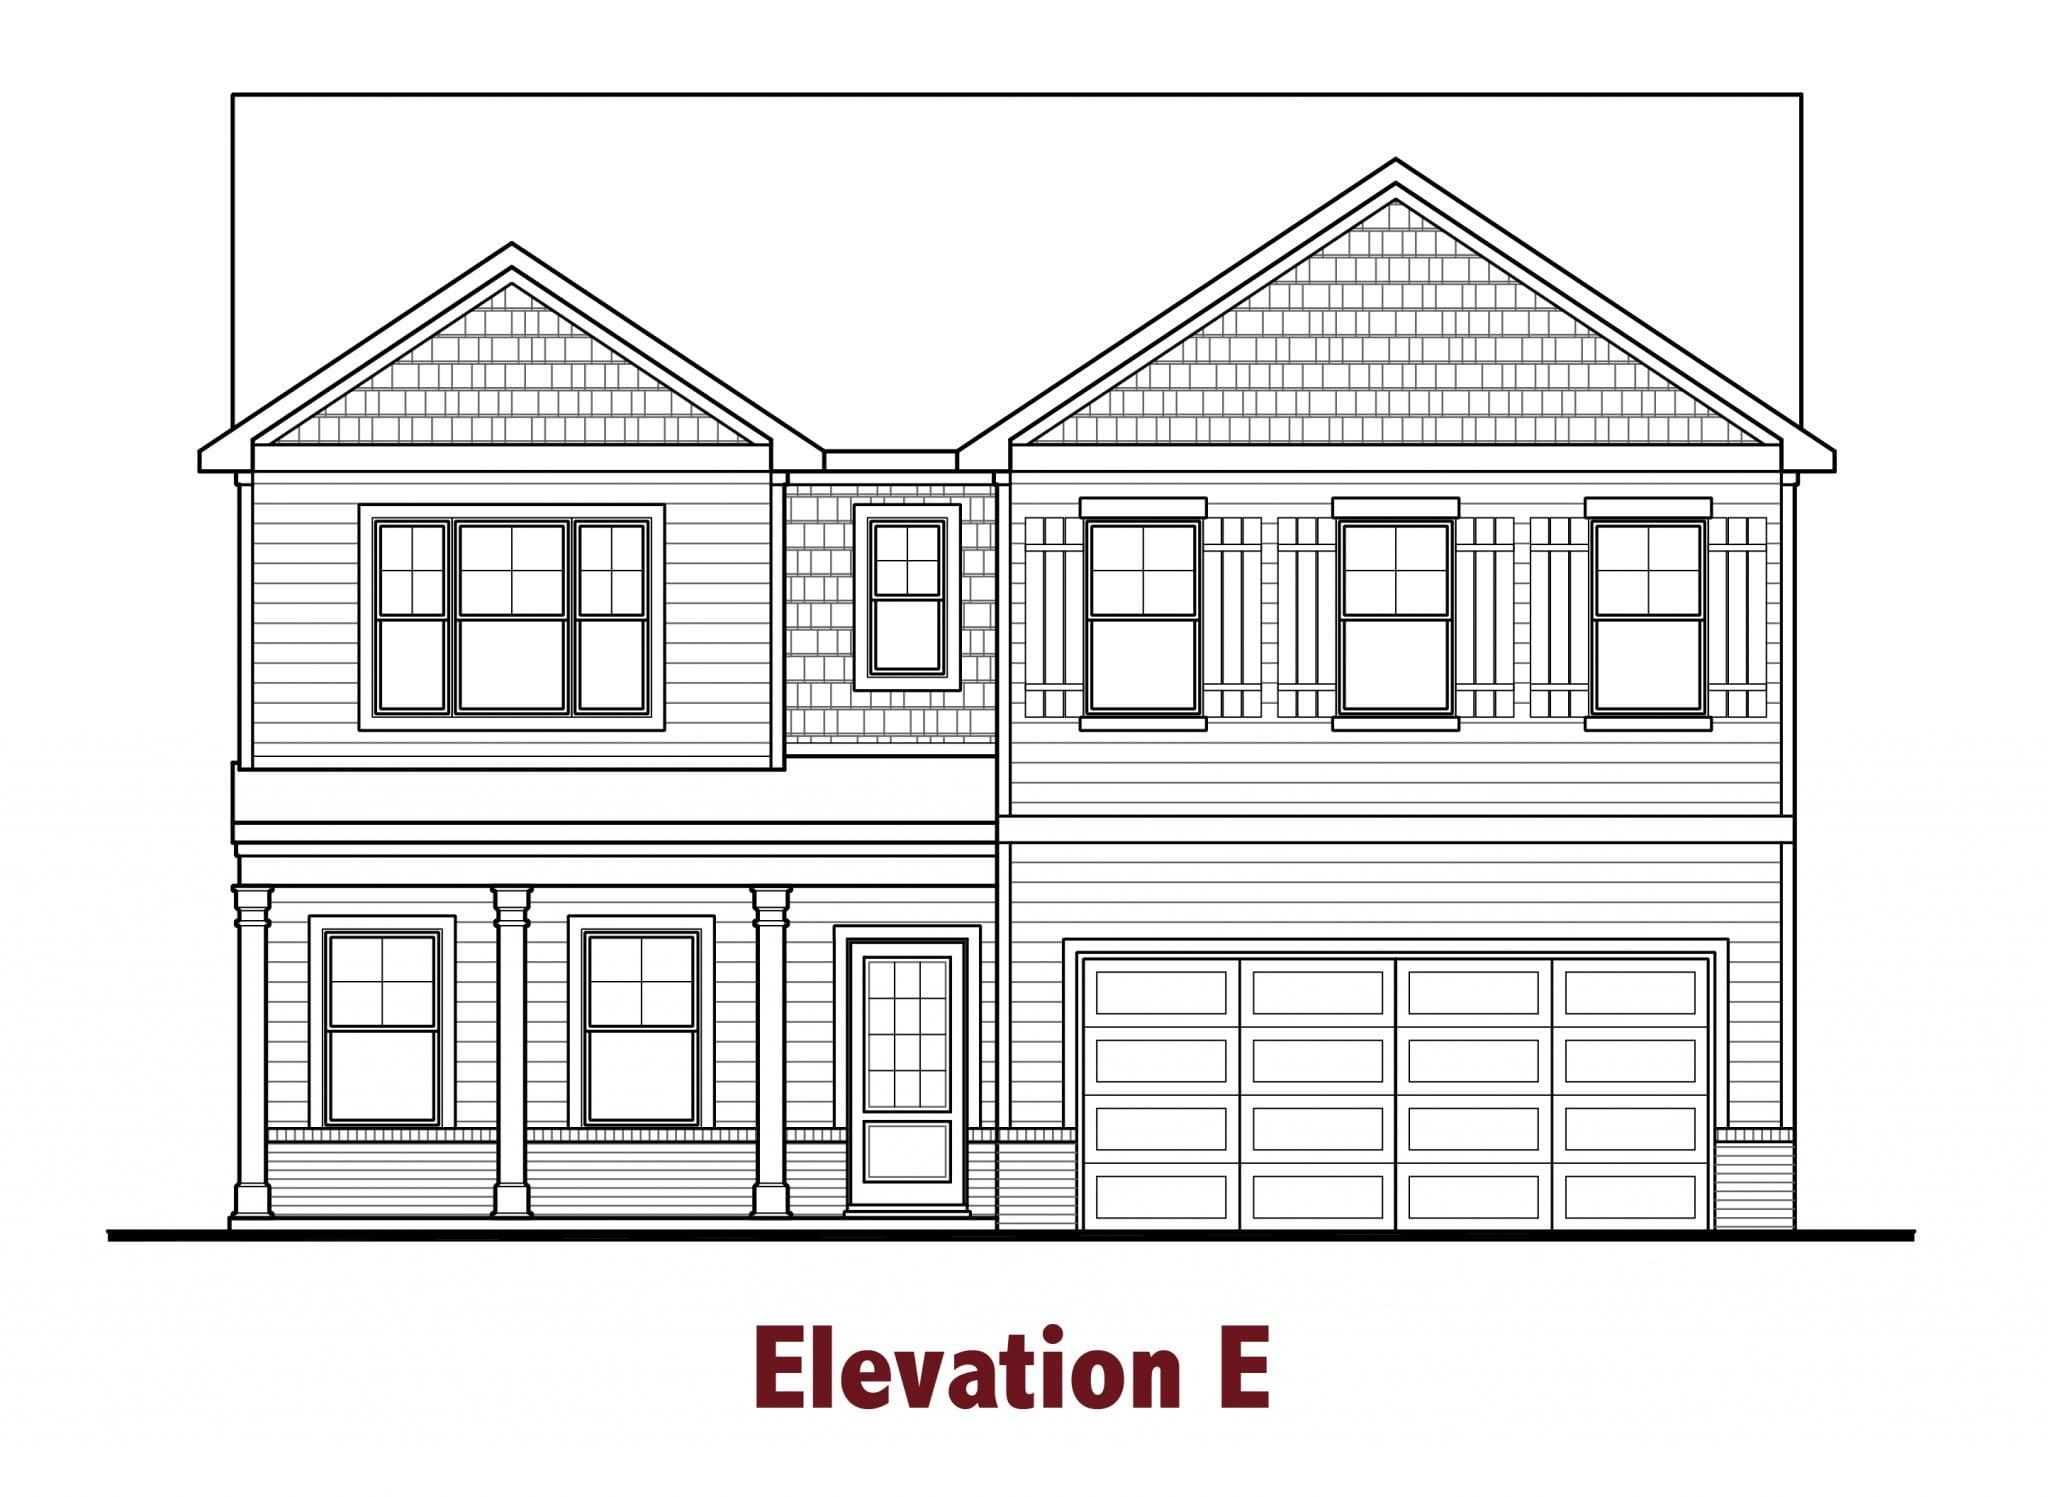 Greenwood elevations Image